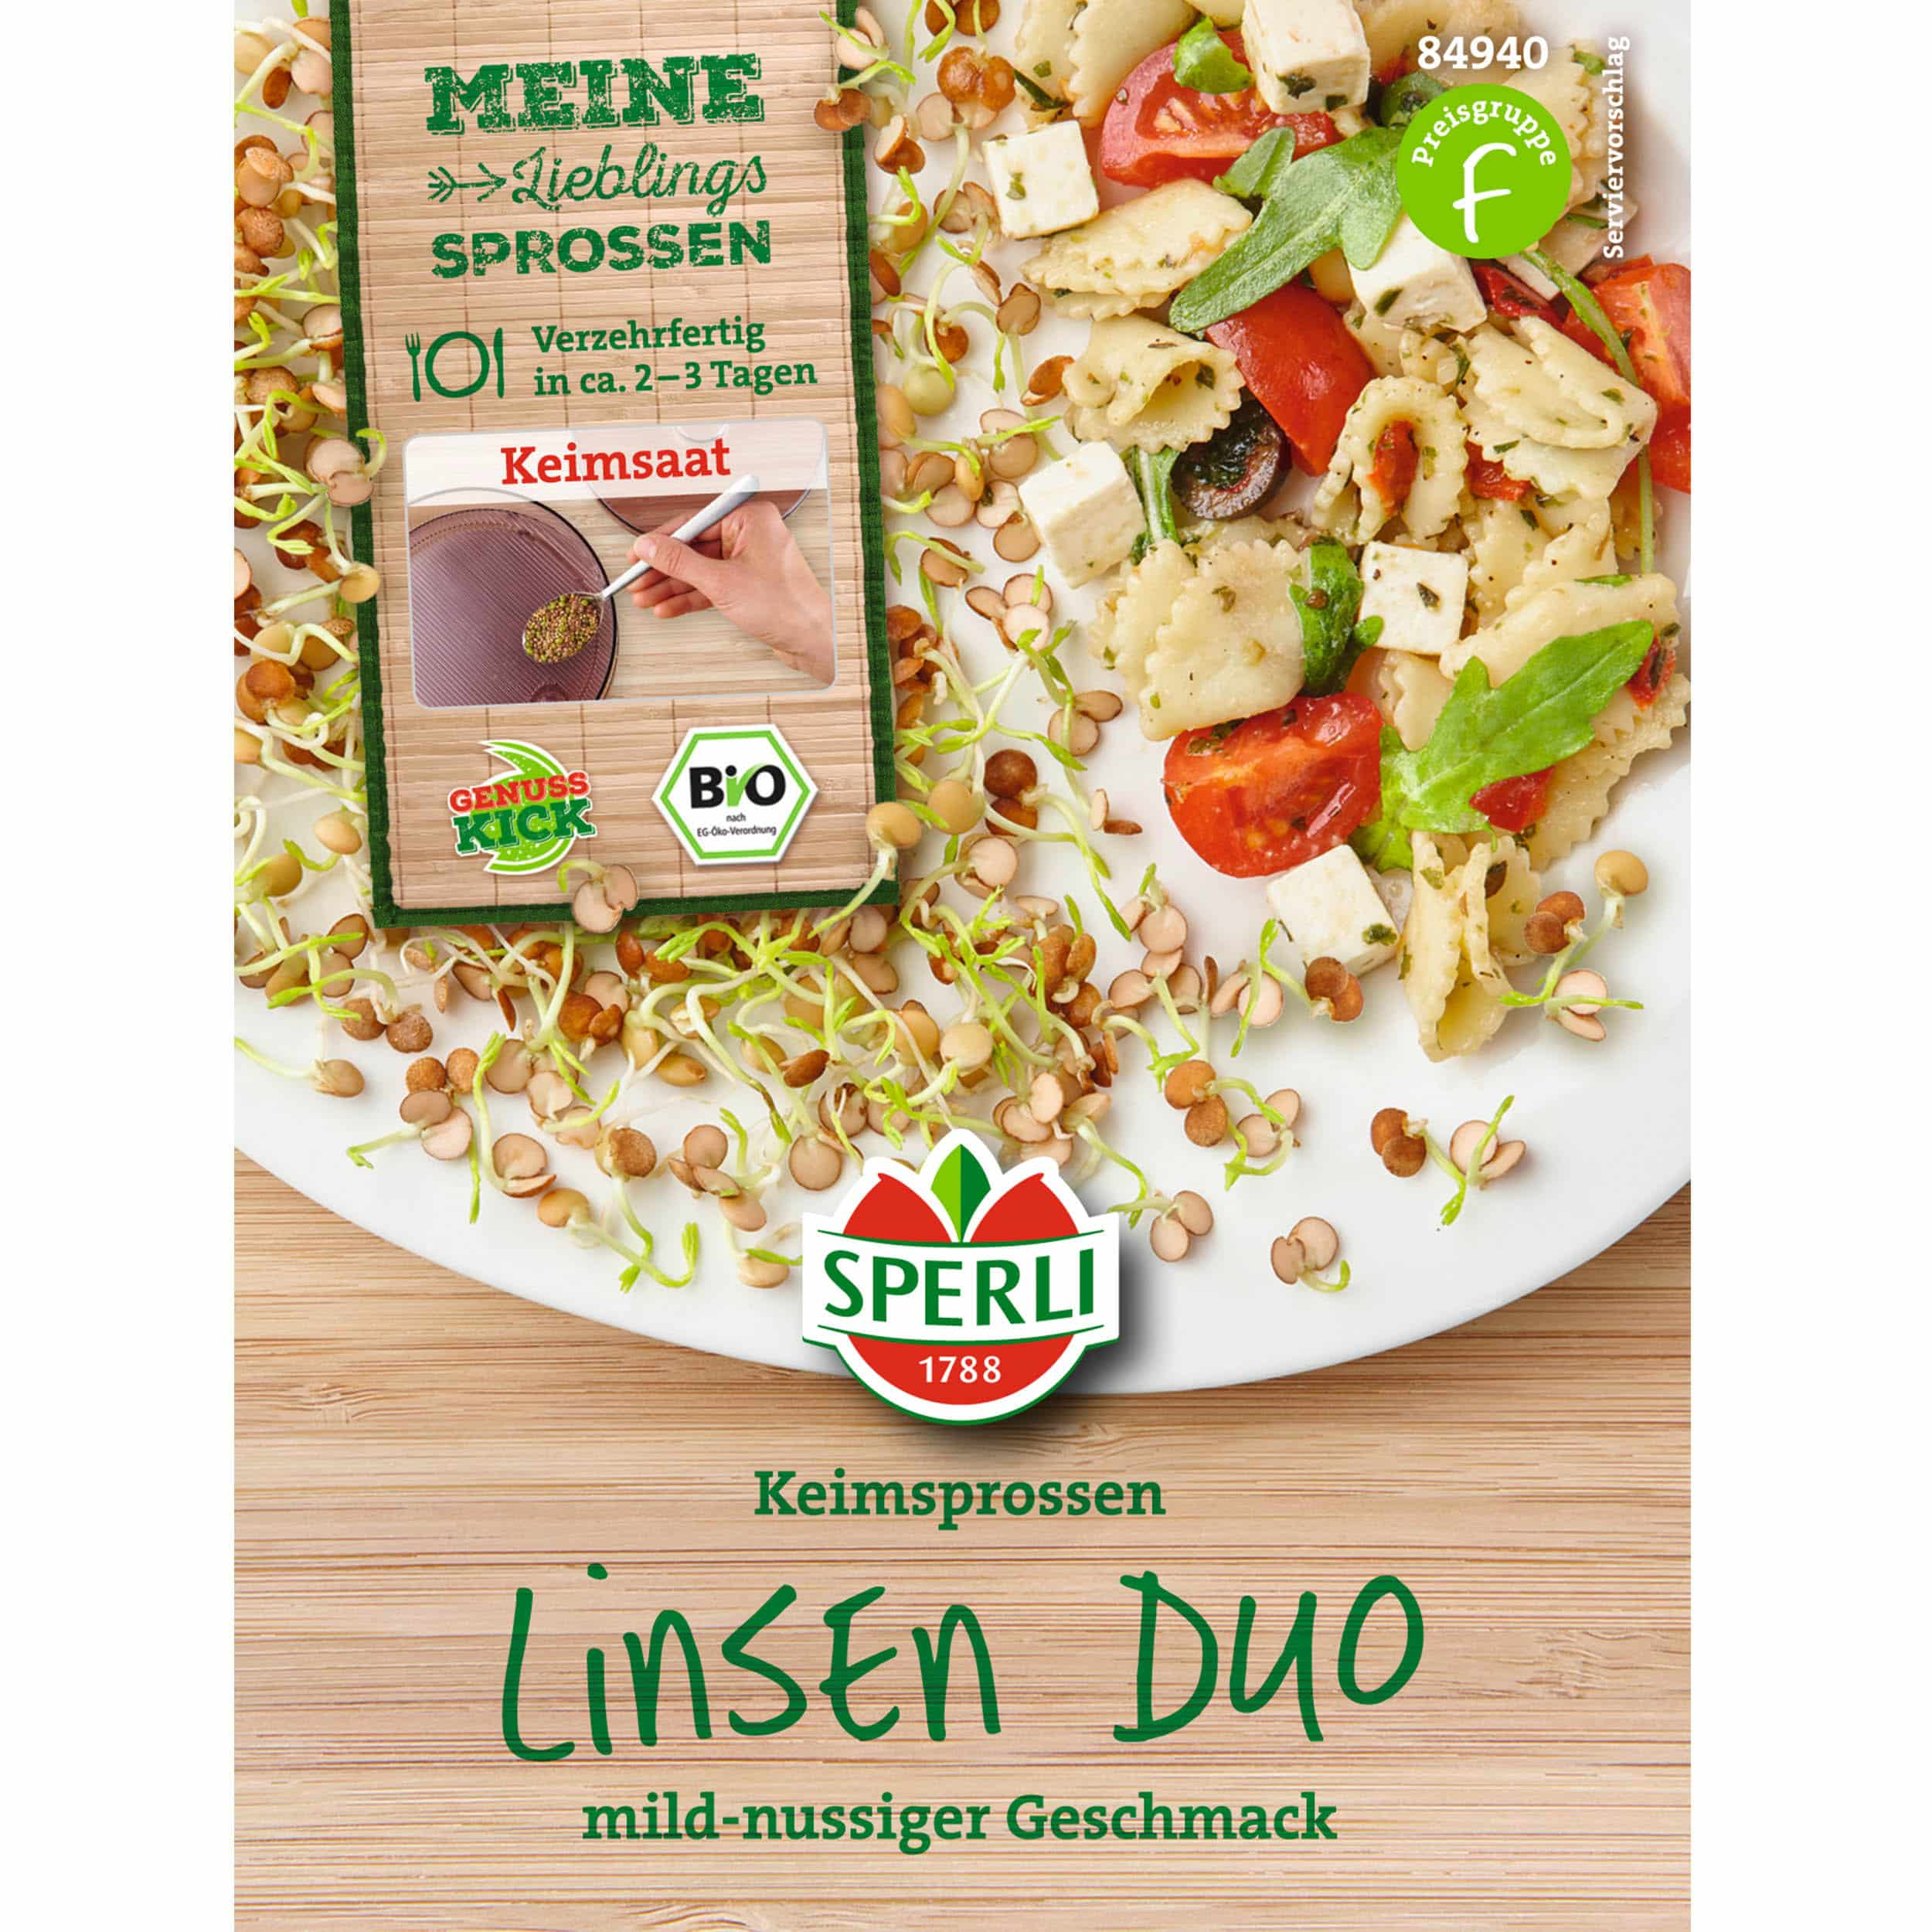 Bio Keimsprossen Linsen Duo